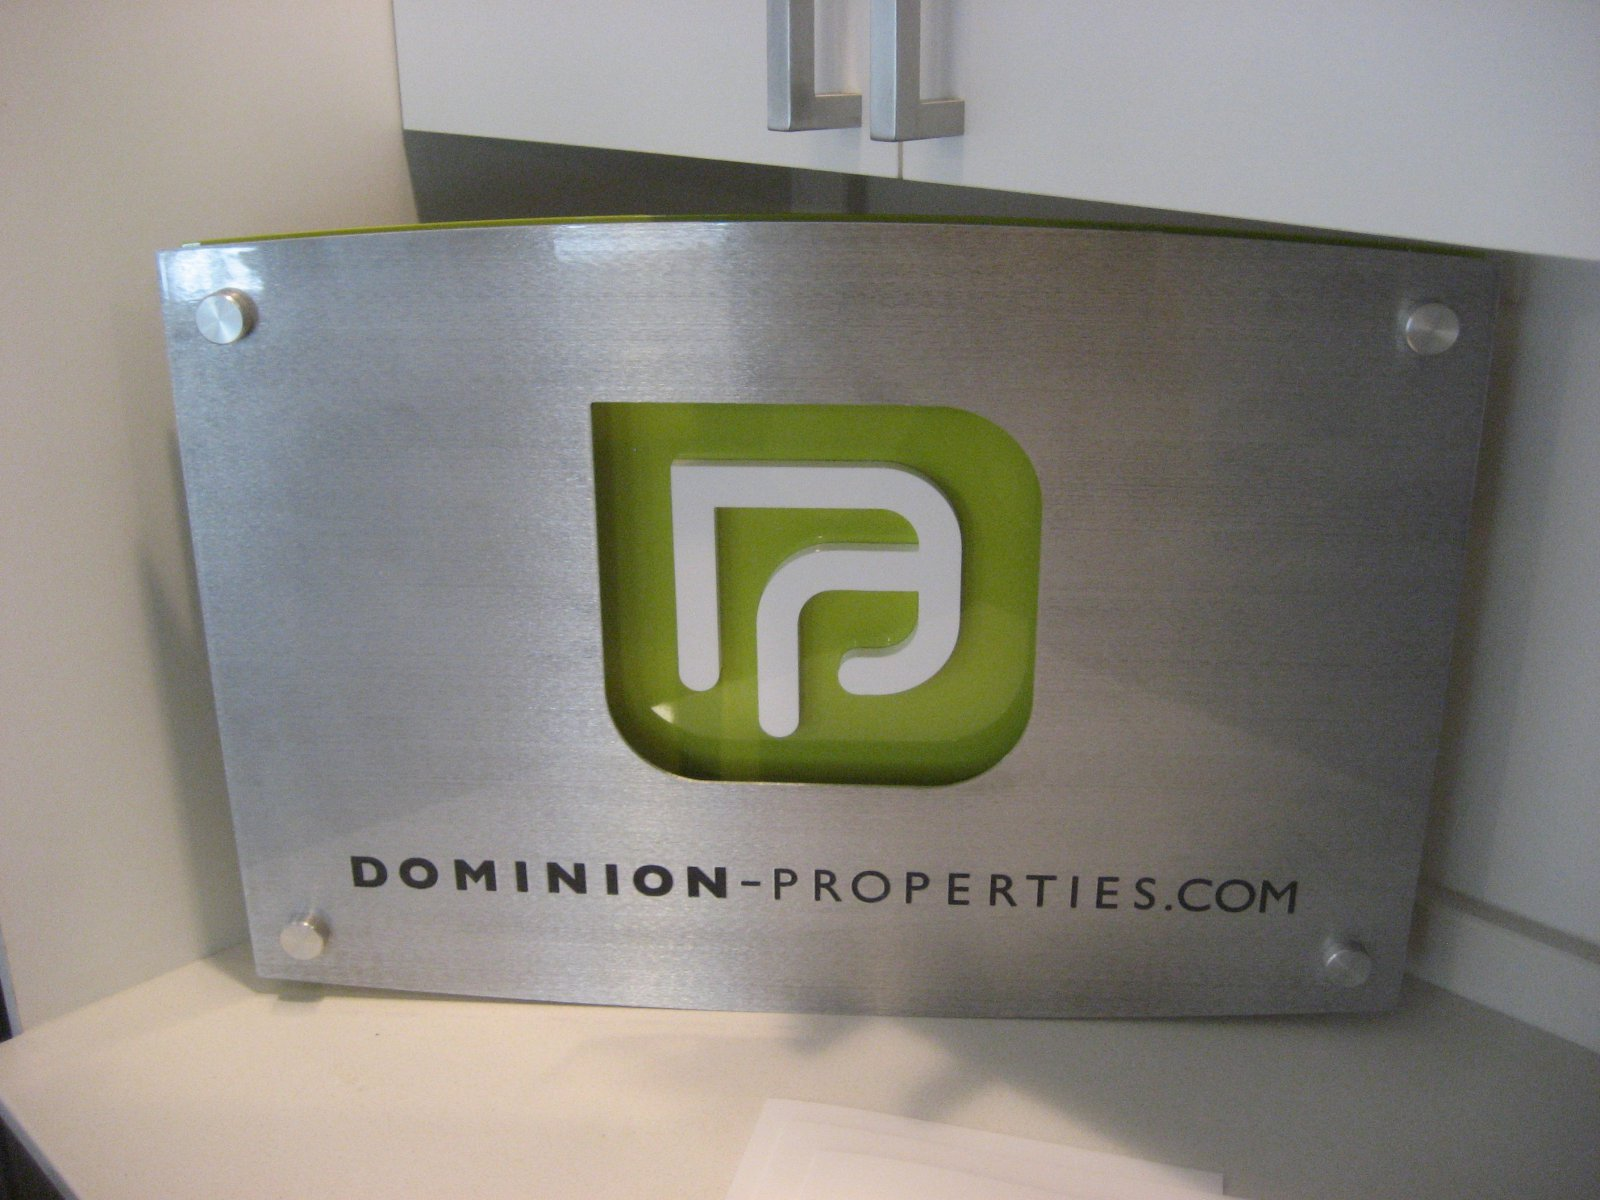 Dominion-Properties.com